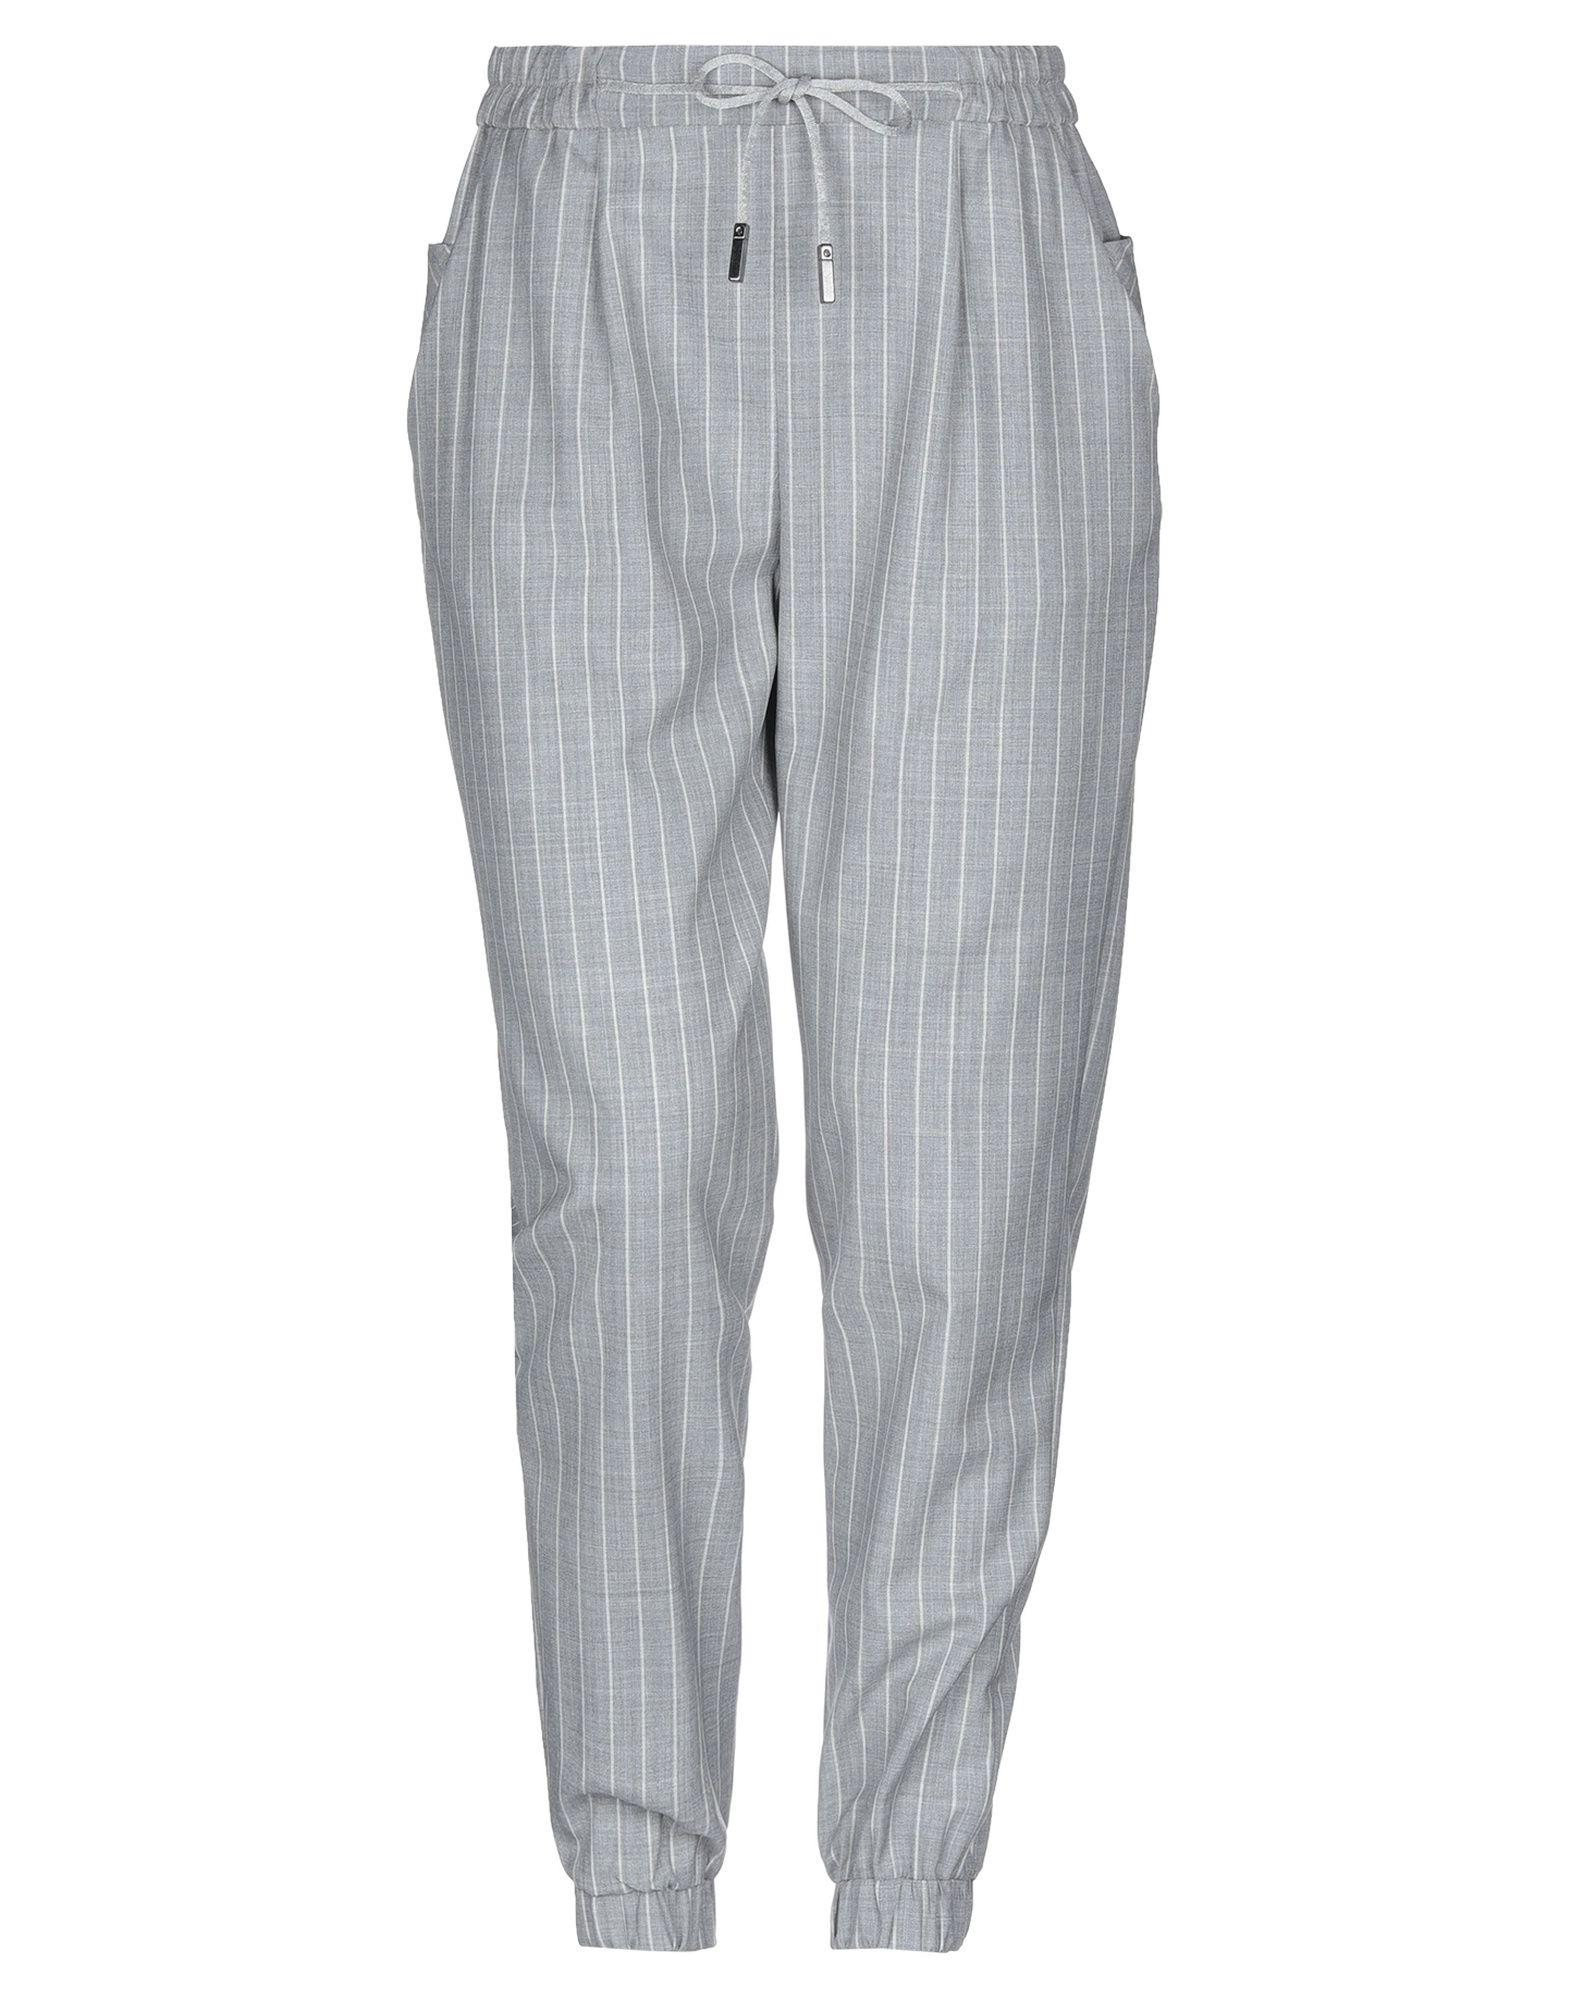 ELEVENTY Повседневные брюки брюки чинос quelle quelle 920895